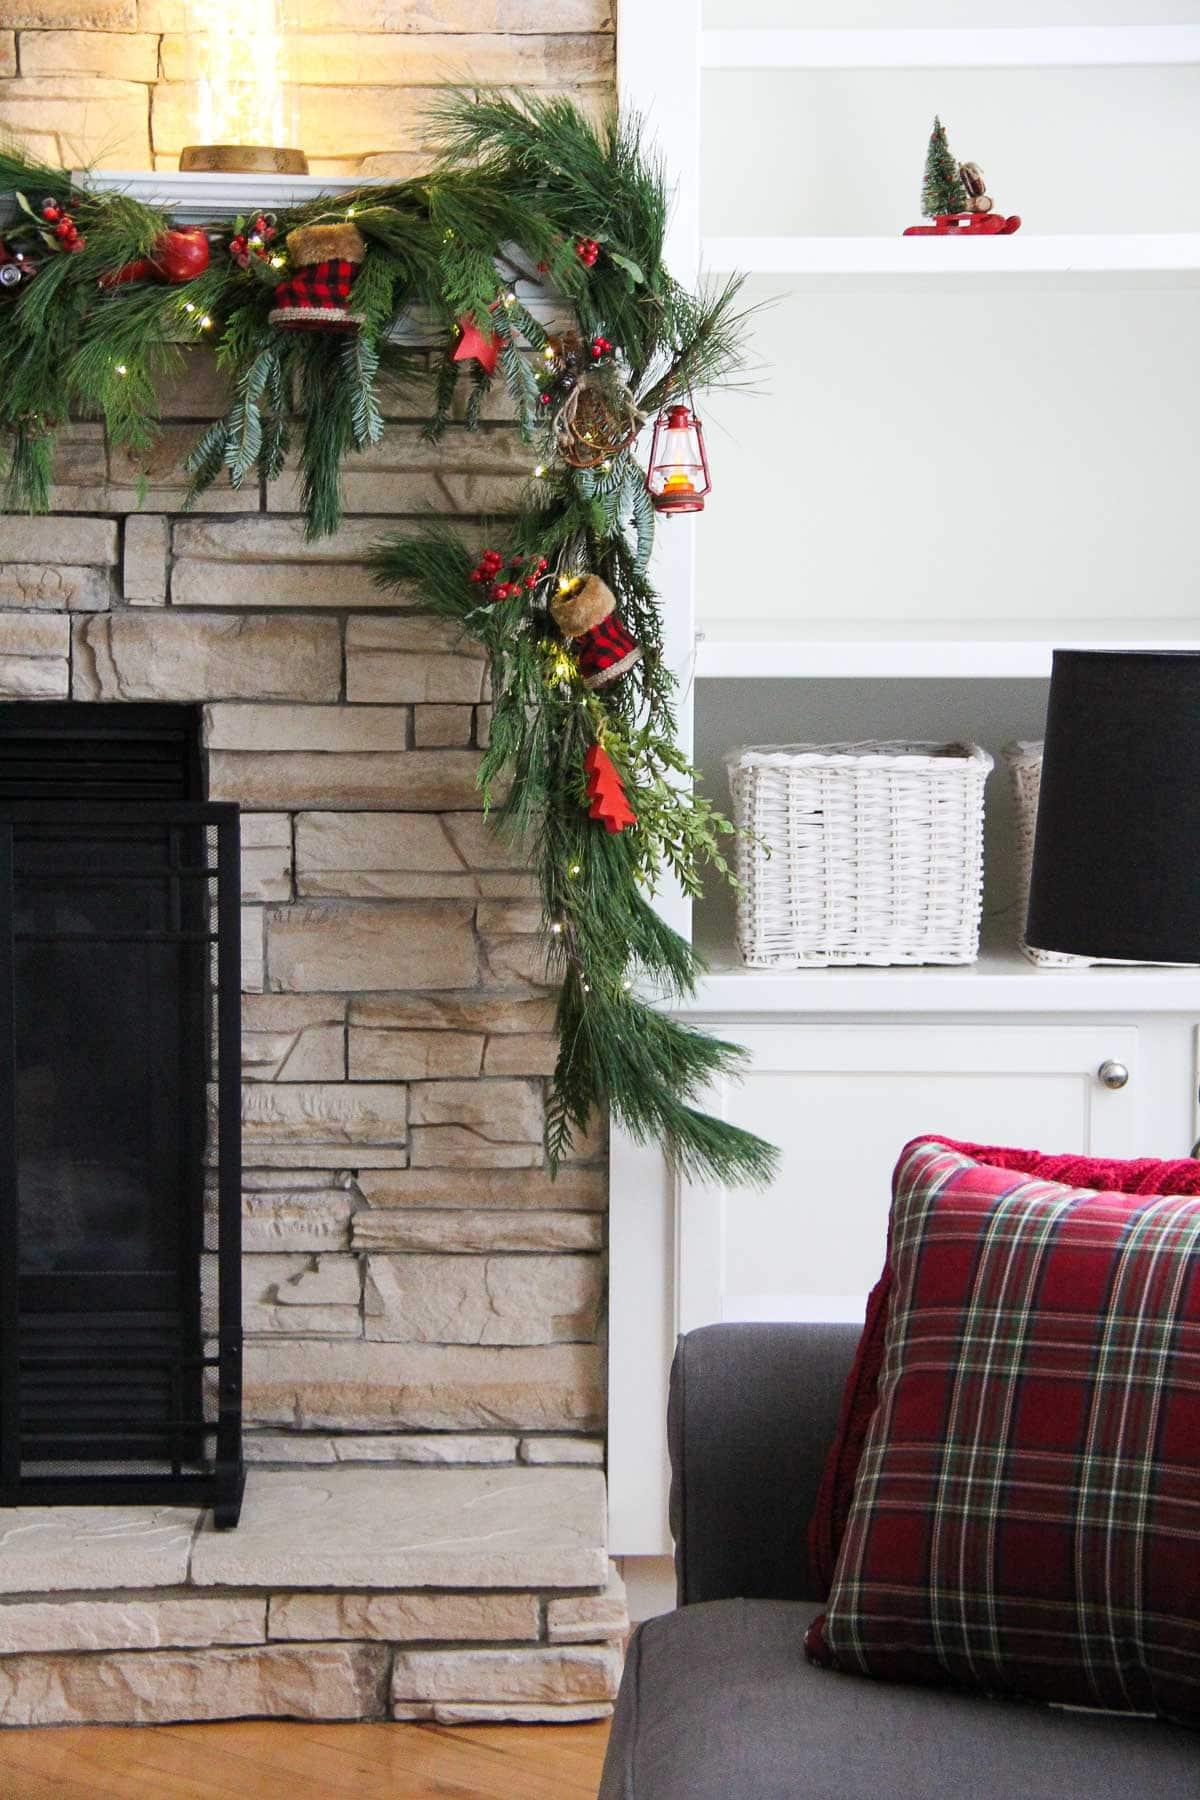 Make a Festive Christmas Mantel Swag!